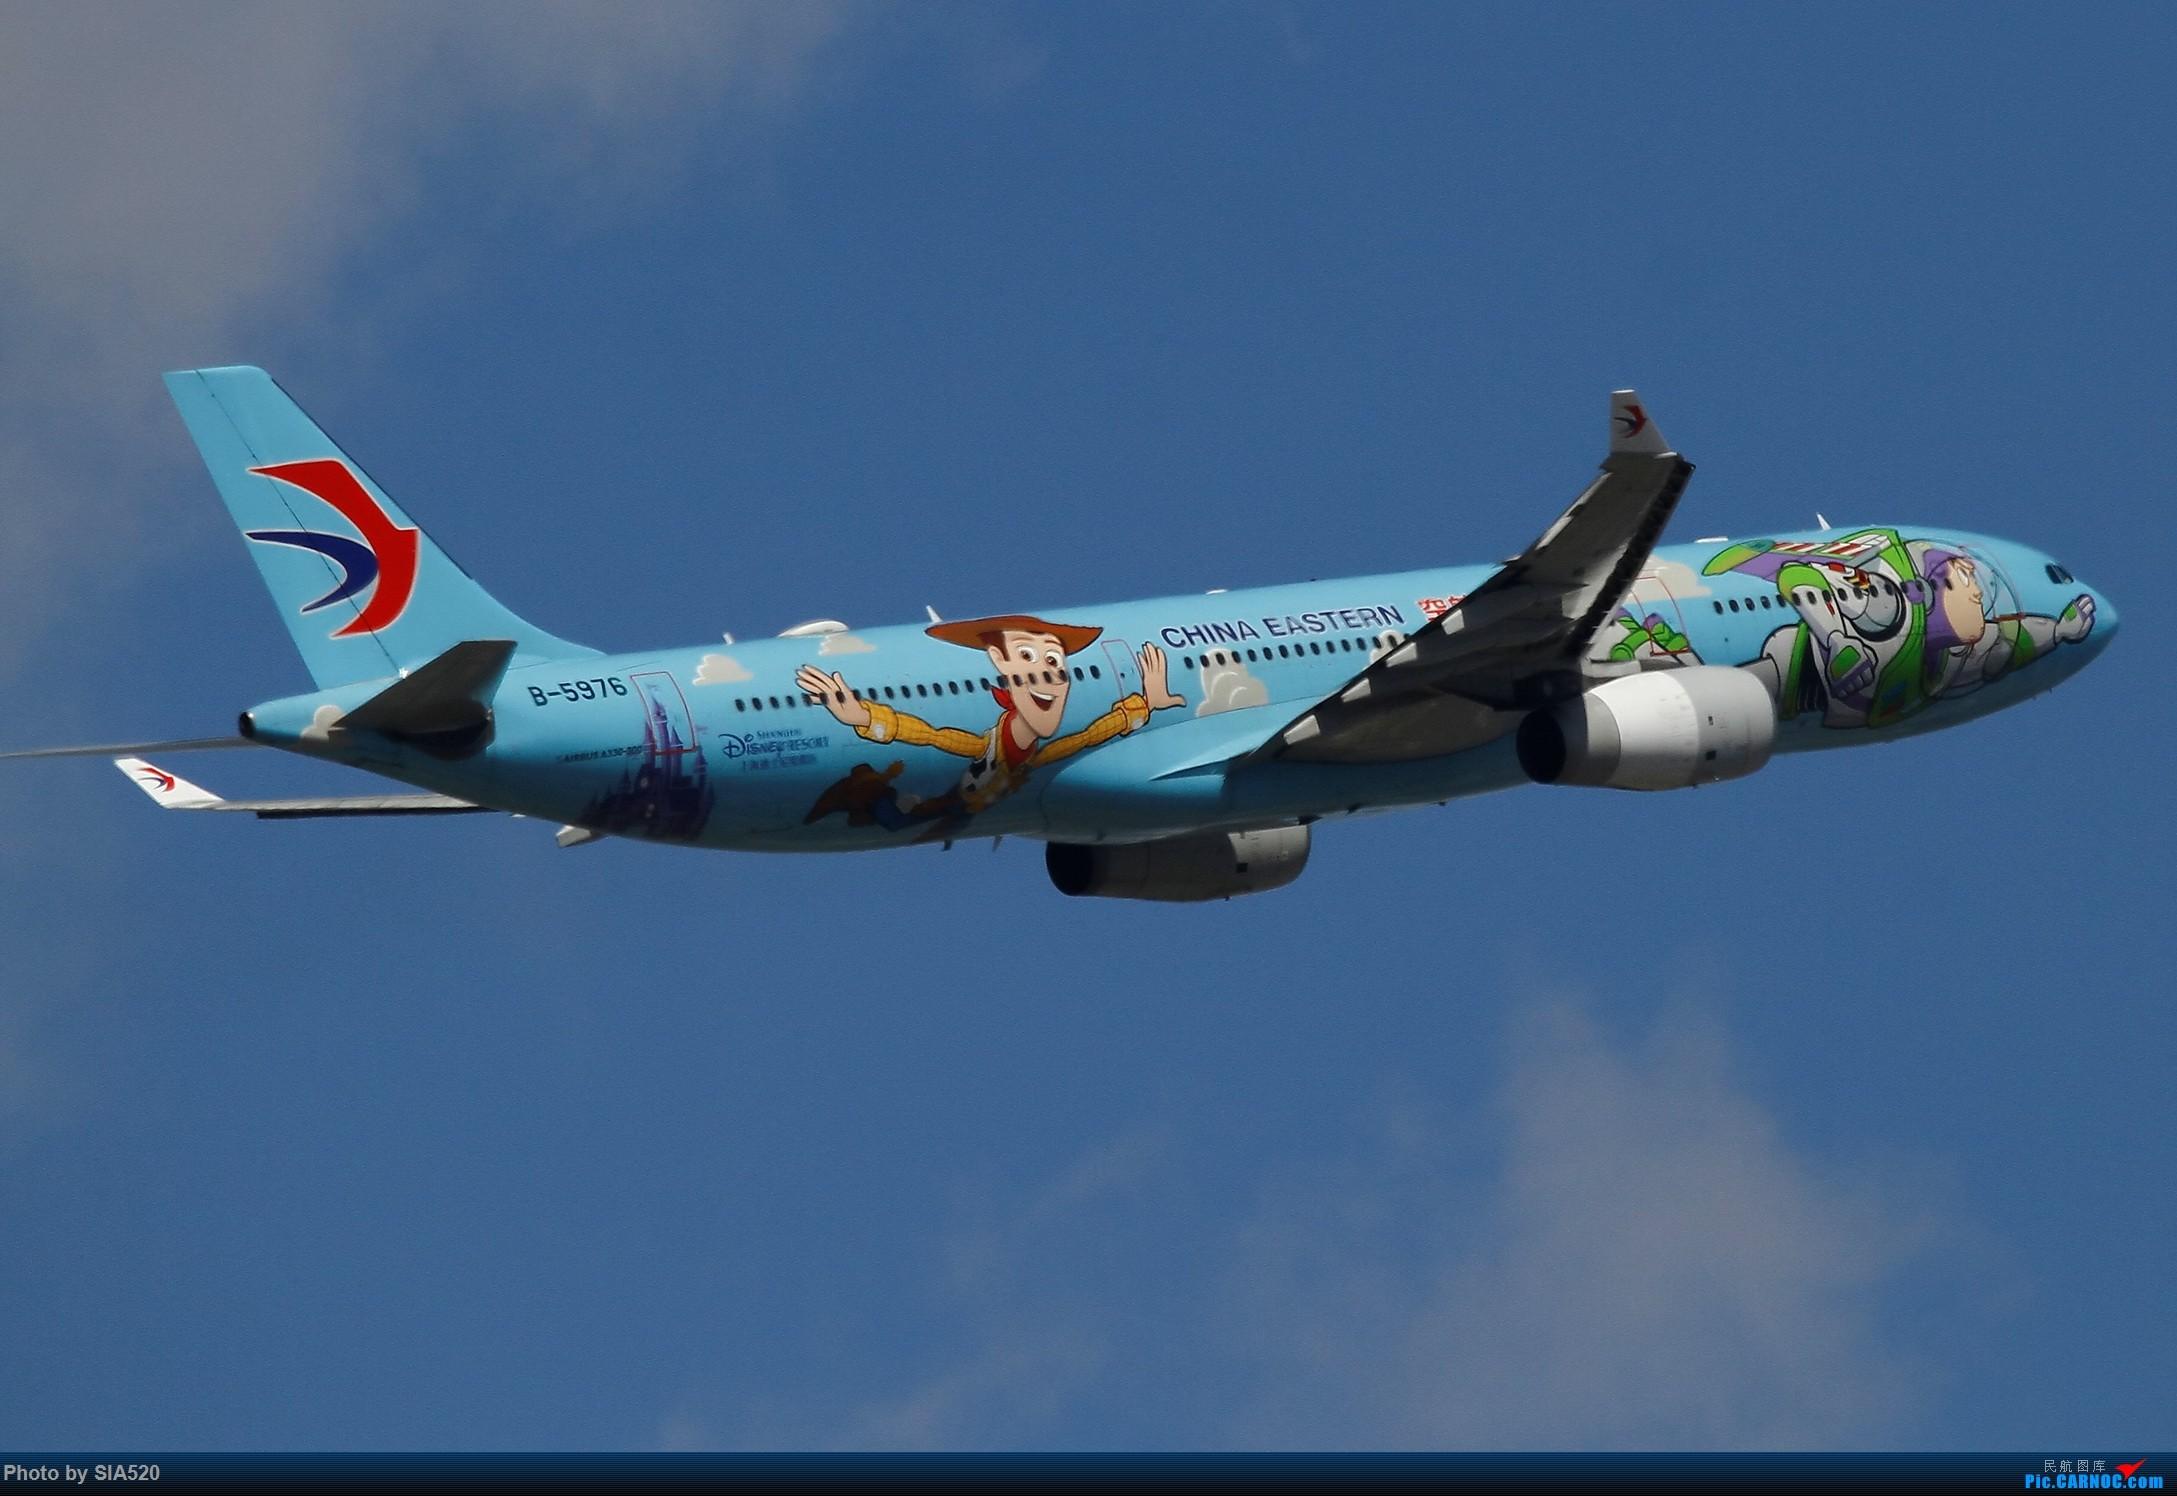 Re:[原创]北京人儿在三亚—600mm解锁凤凰 AIRBUS A330-300 B-5976 中国三亚凤凰国际机场